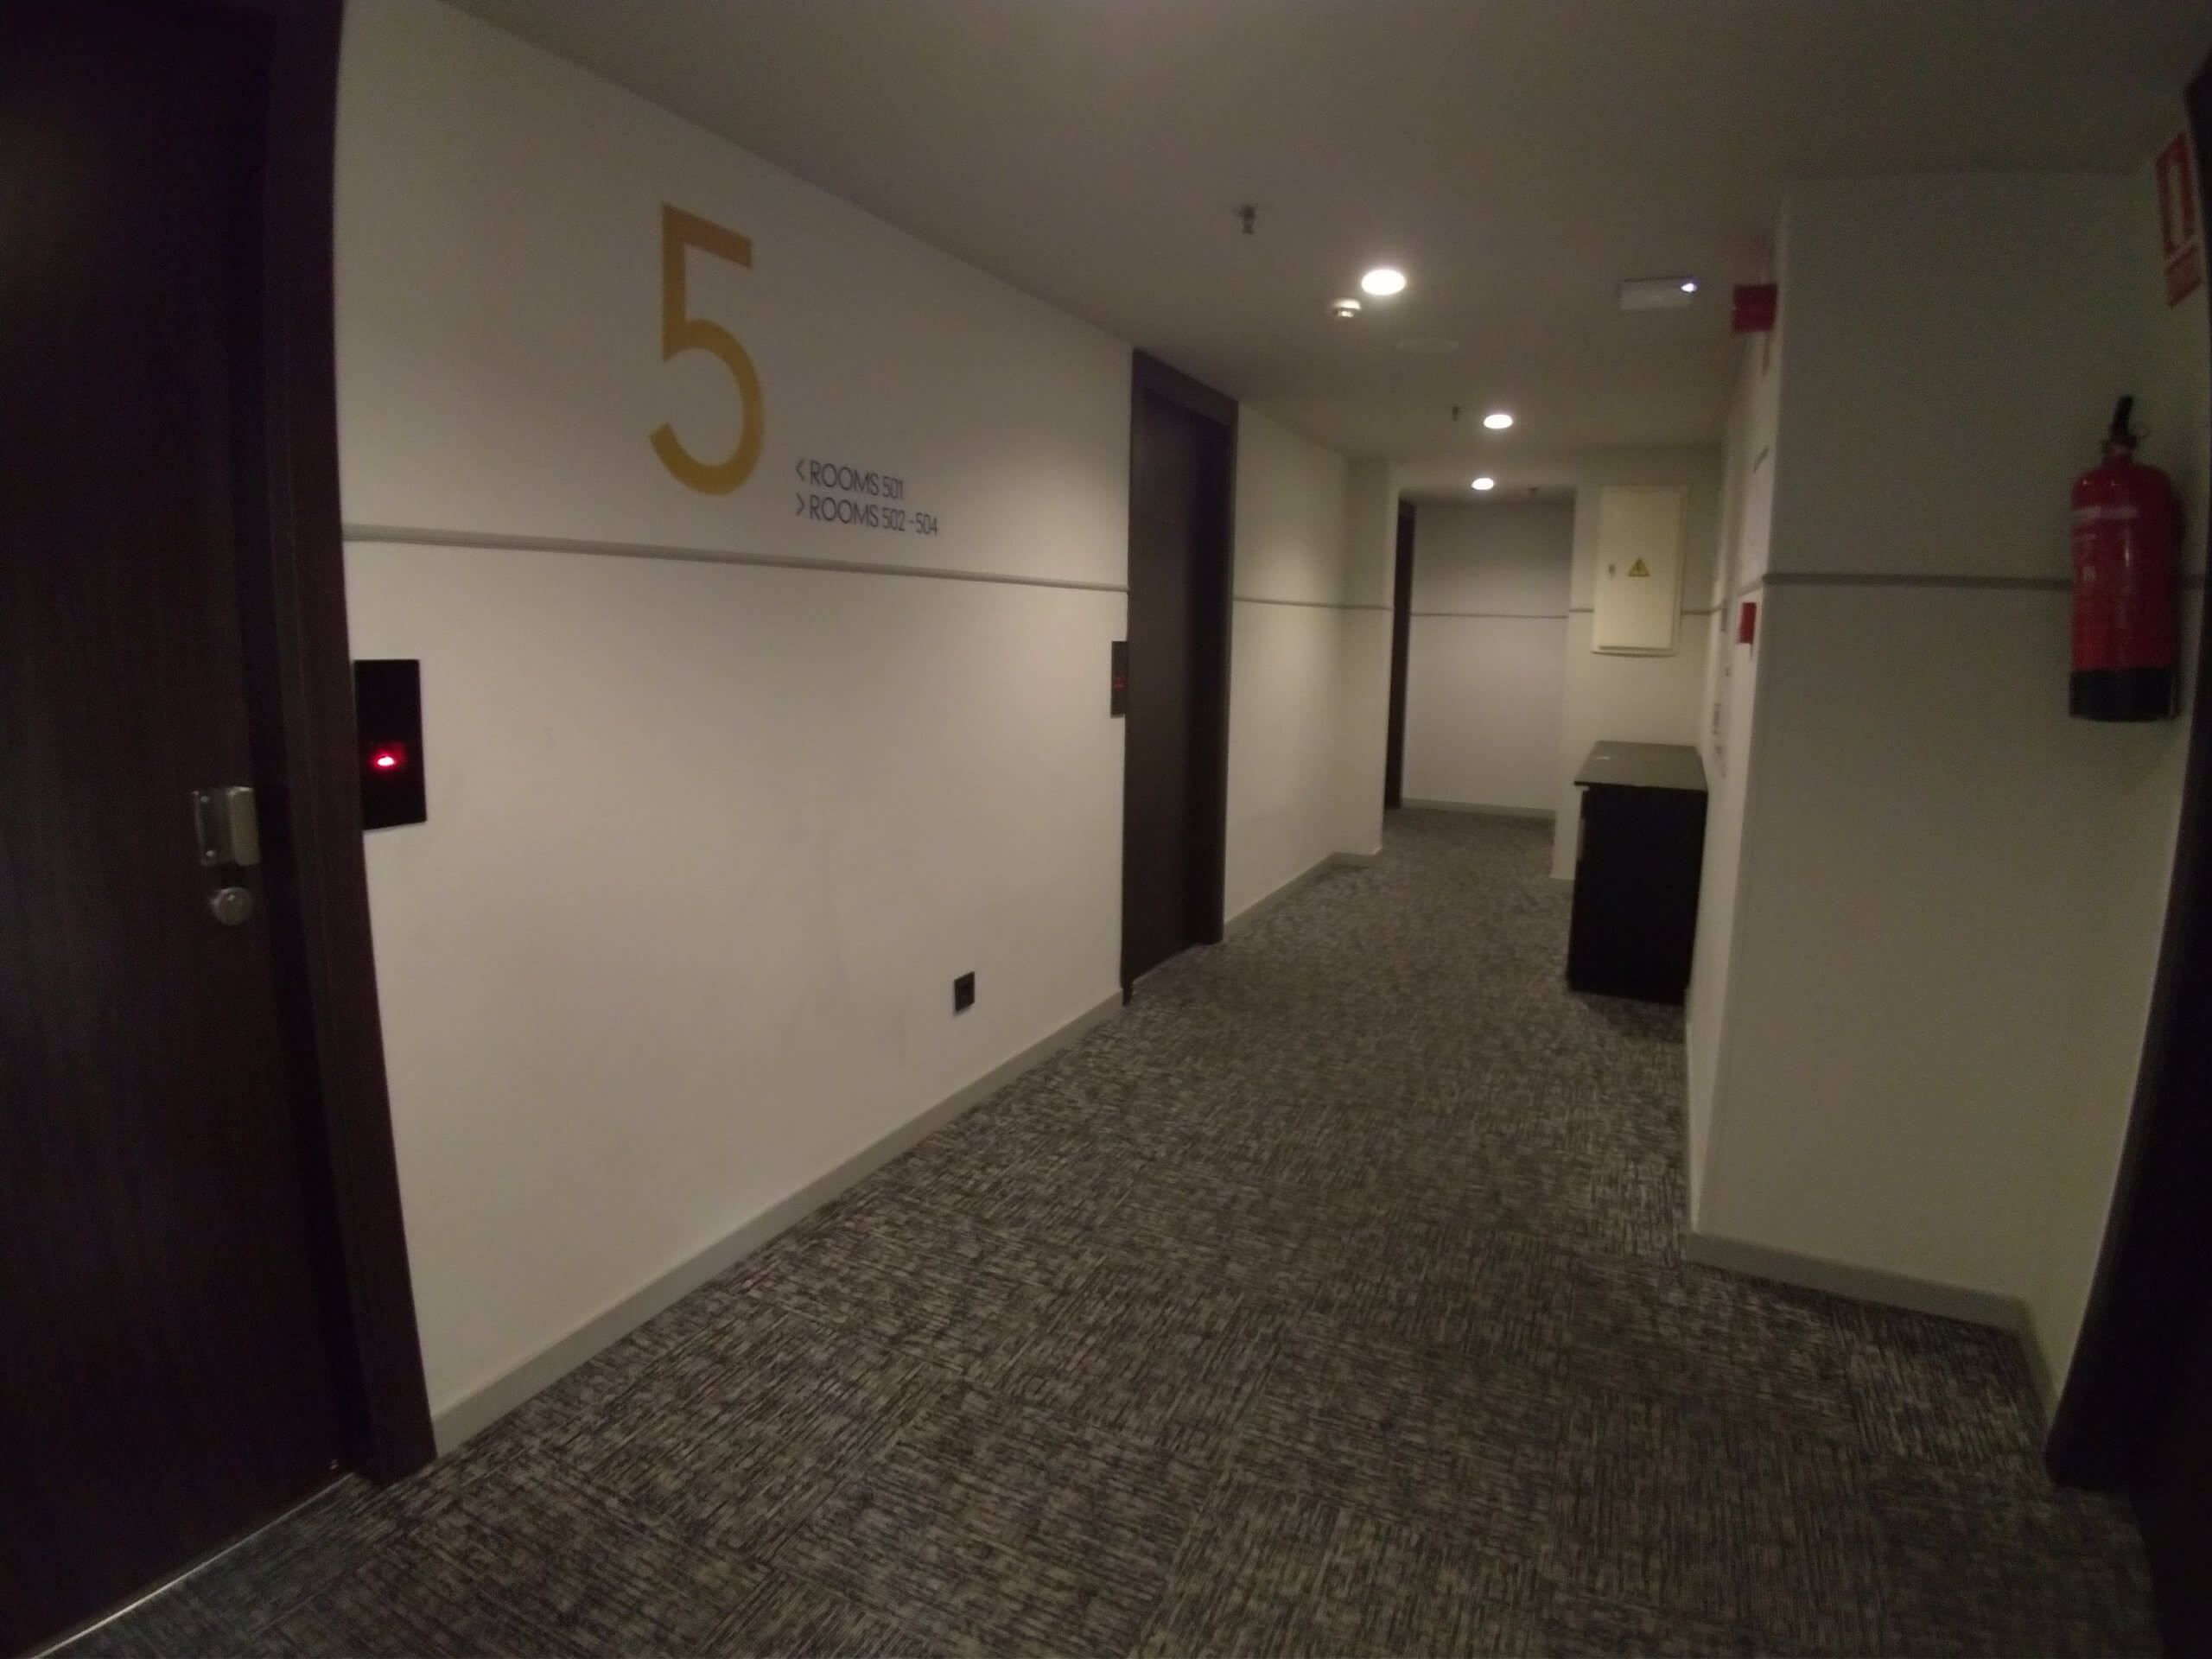 「TOC Hostel Madrid」は満足度の高いゲストハウス